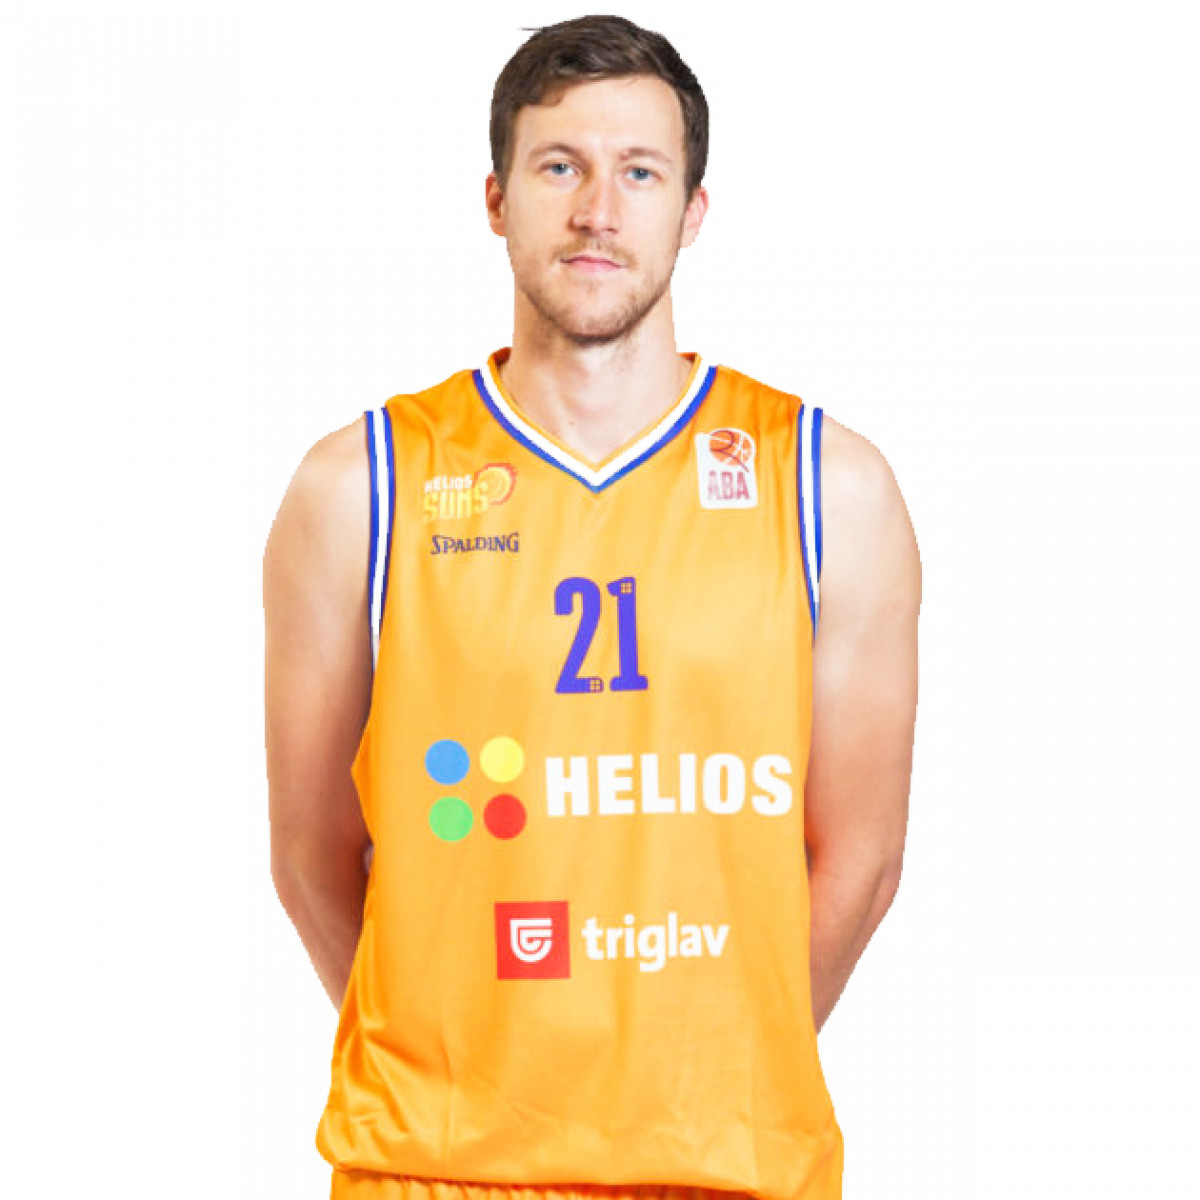 Photo of Blaz Mahkovic, 2019-2020 season